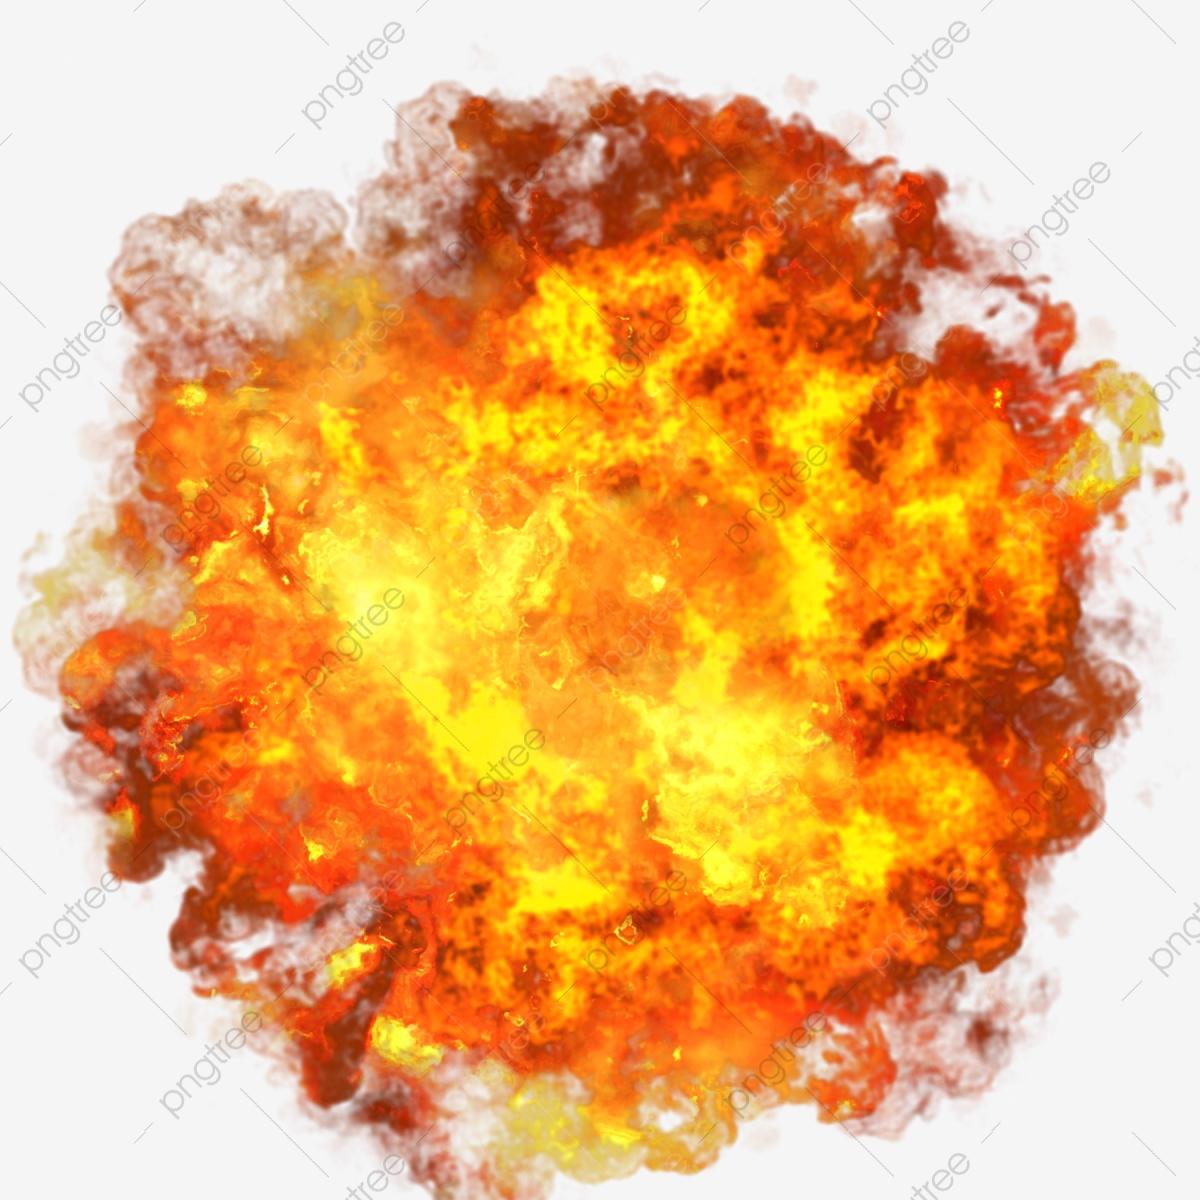 Fire blast png transparent. Explosion clipart flame